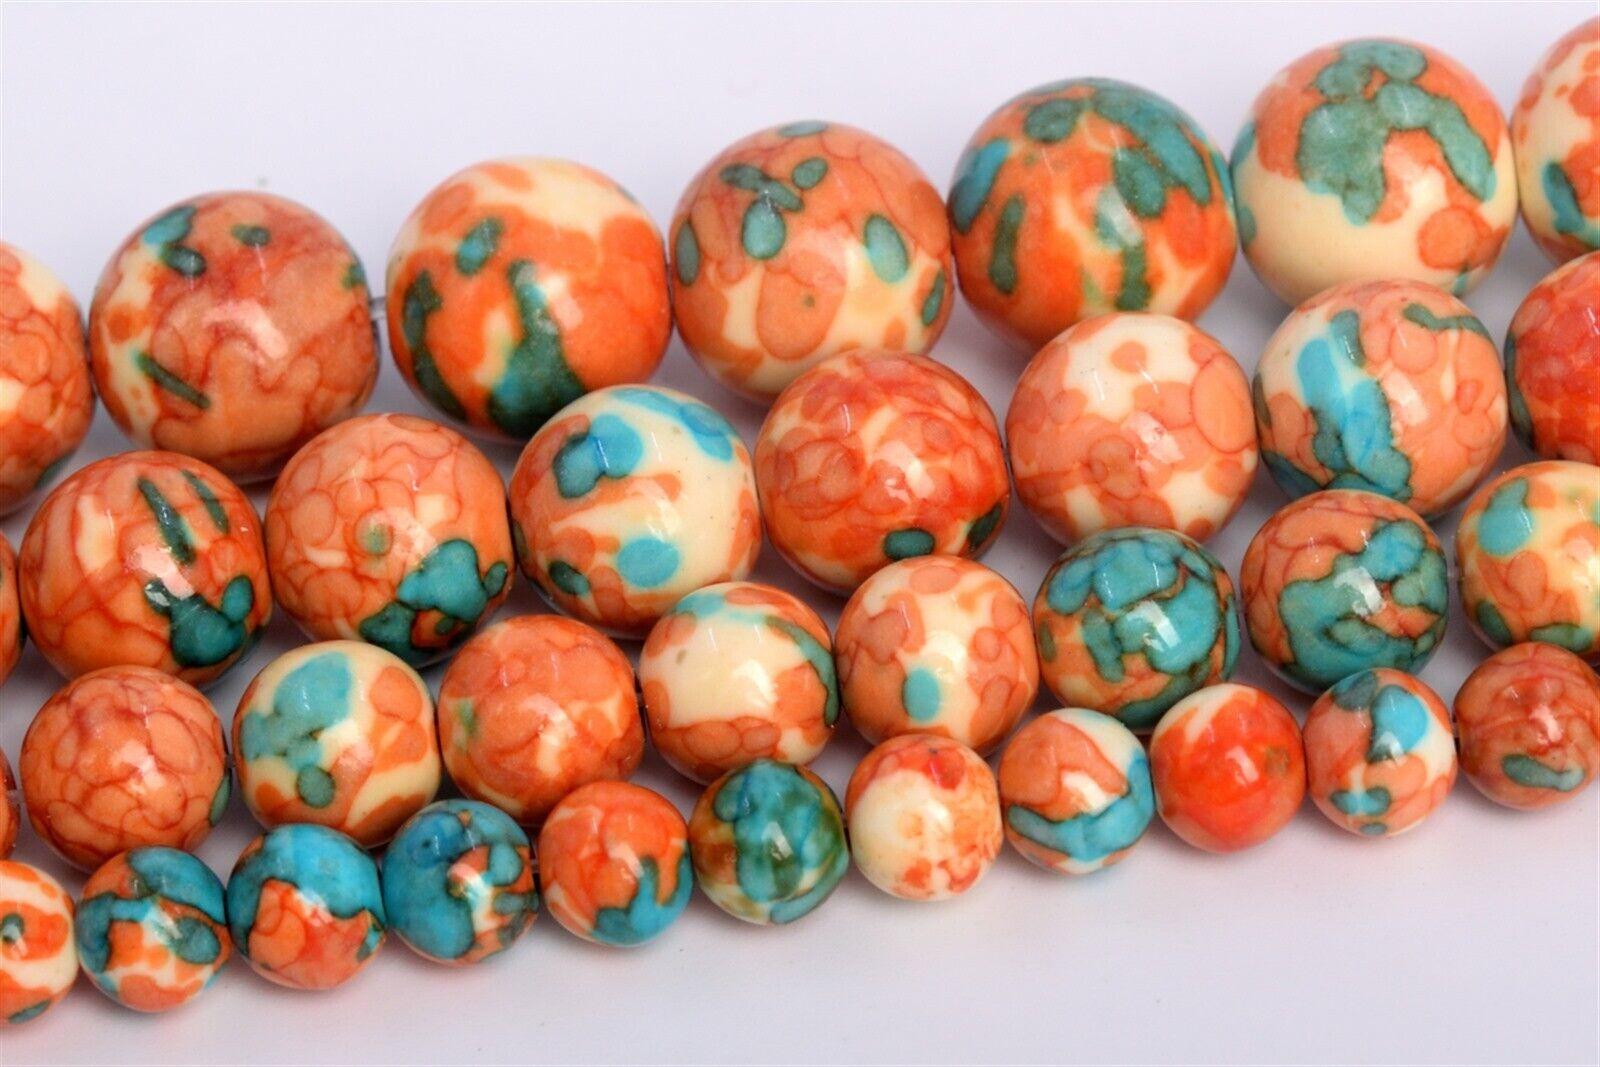 107002 8MM Matte Dark Blue Jade Beads Grade AAA Natural Round Gemstone Loose Beads 46  24 Pcs